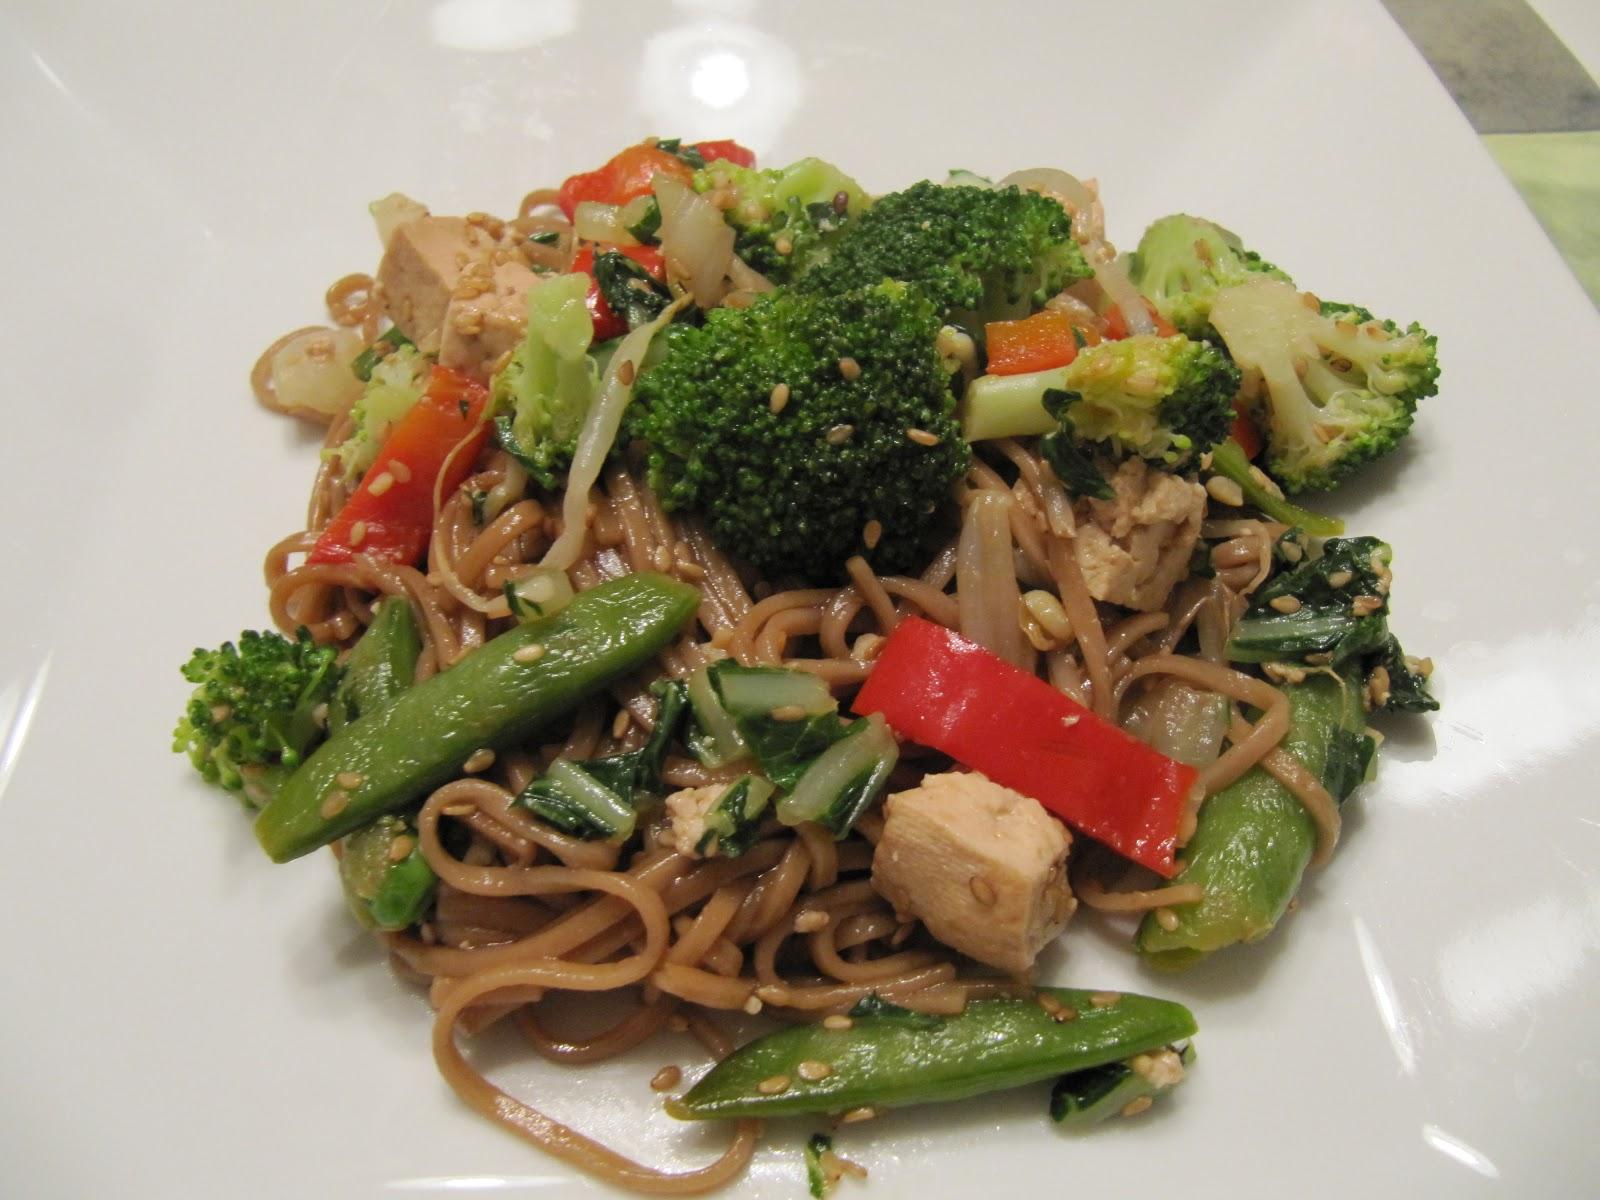 Cookin' in Anne's Kitchen: Tofu, Sobe, and Veggie Stir-Fry